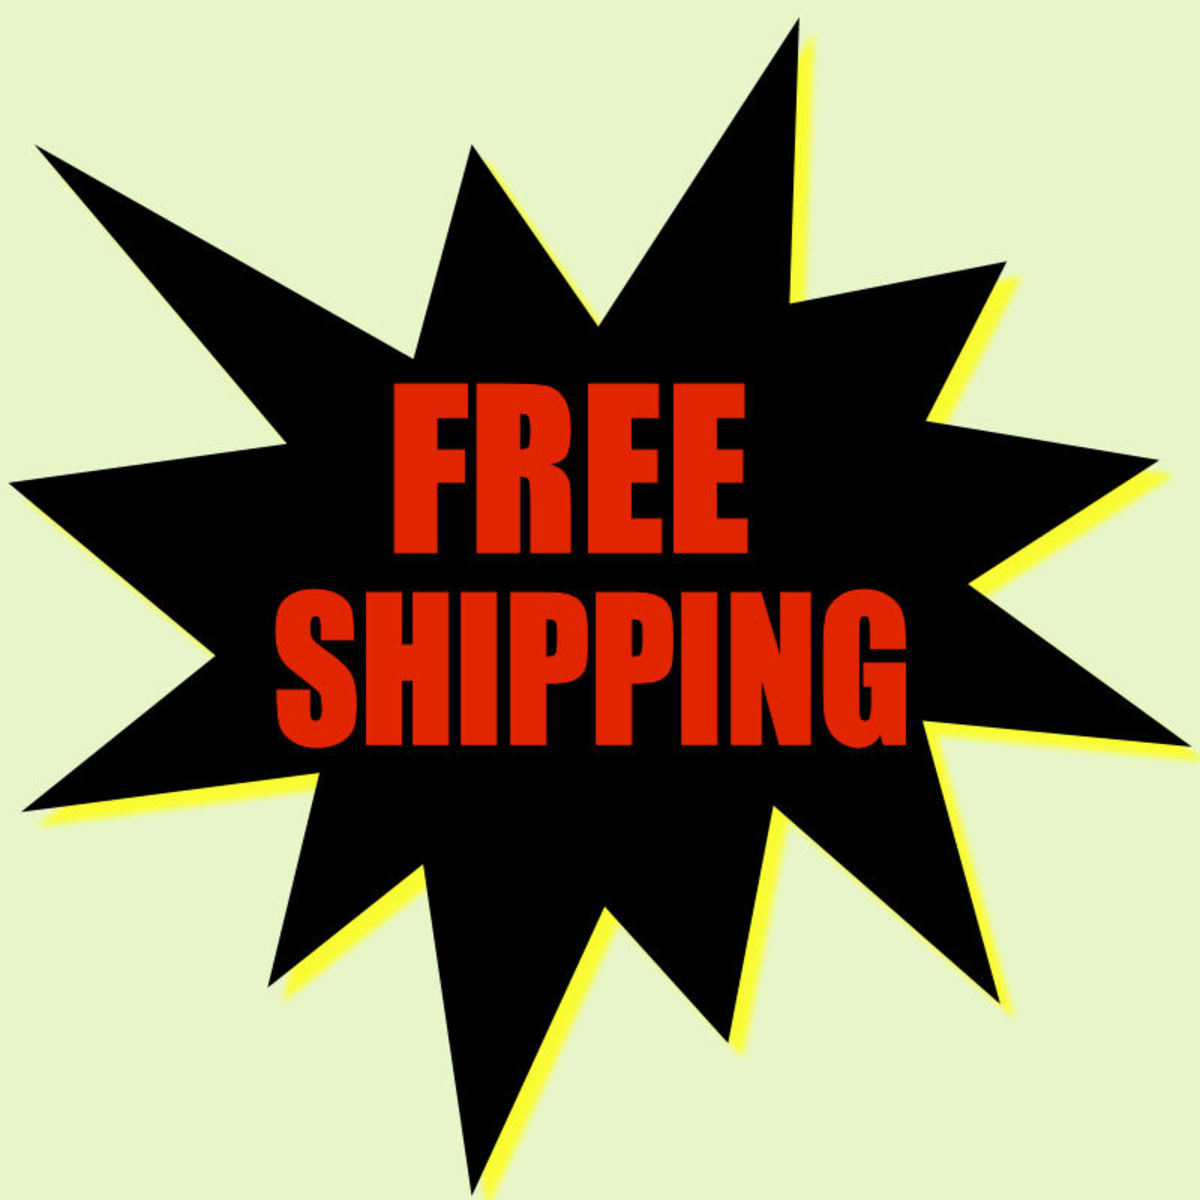 offer-free-shipping-ebay